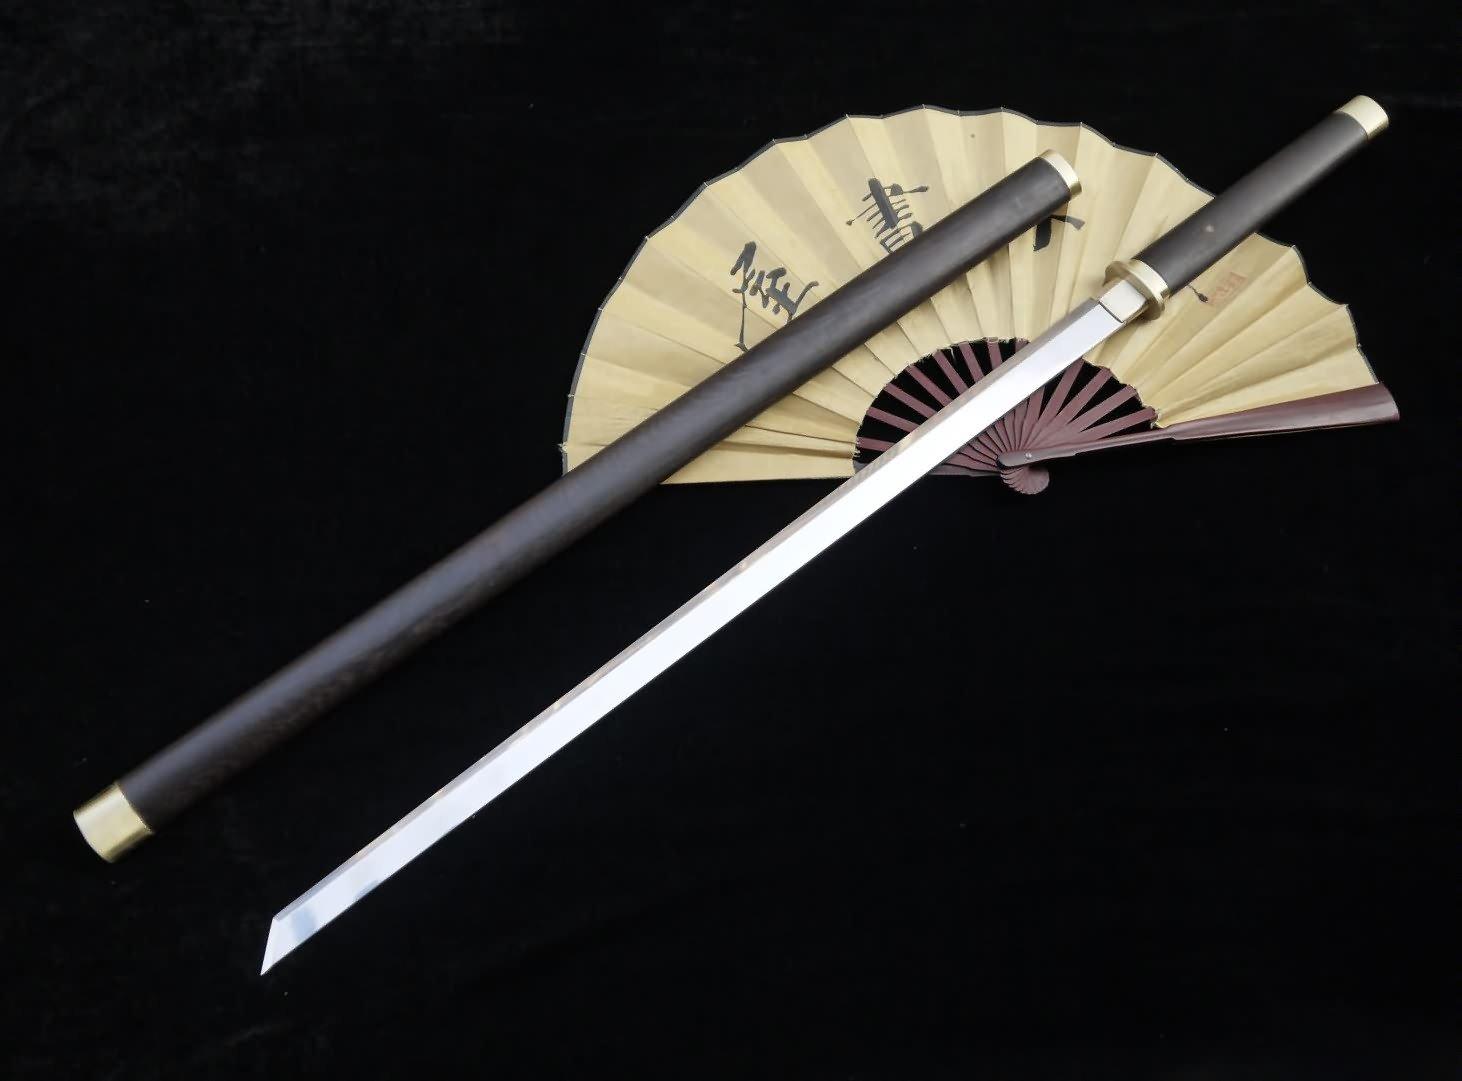 Longquan sword/Tang dao/Medium carbon steel/Rosewood scabbard/Full tang/Length 39''